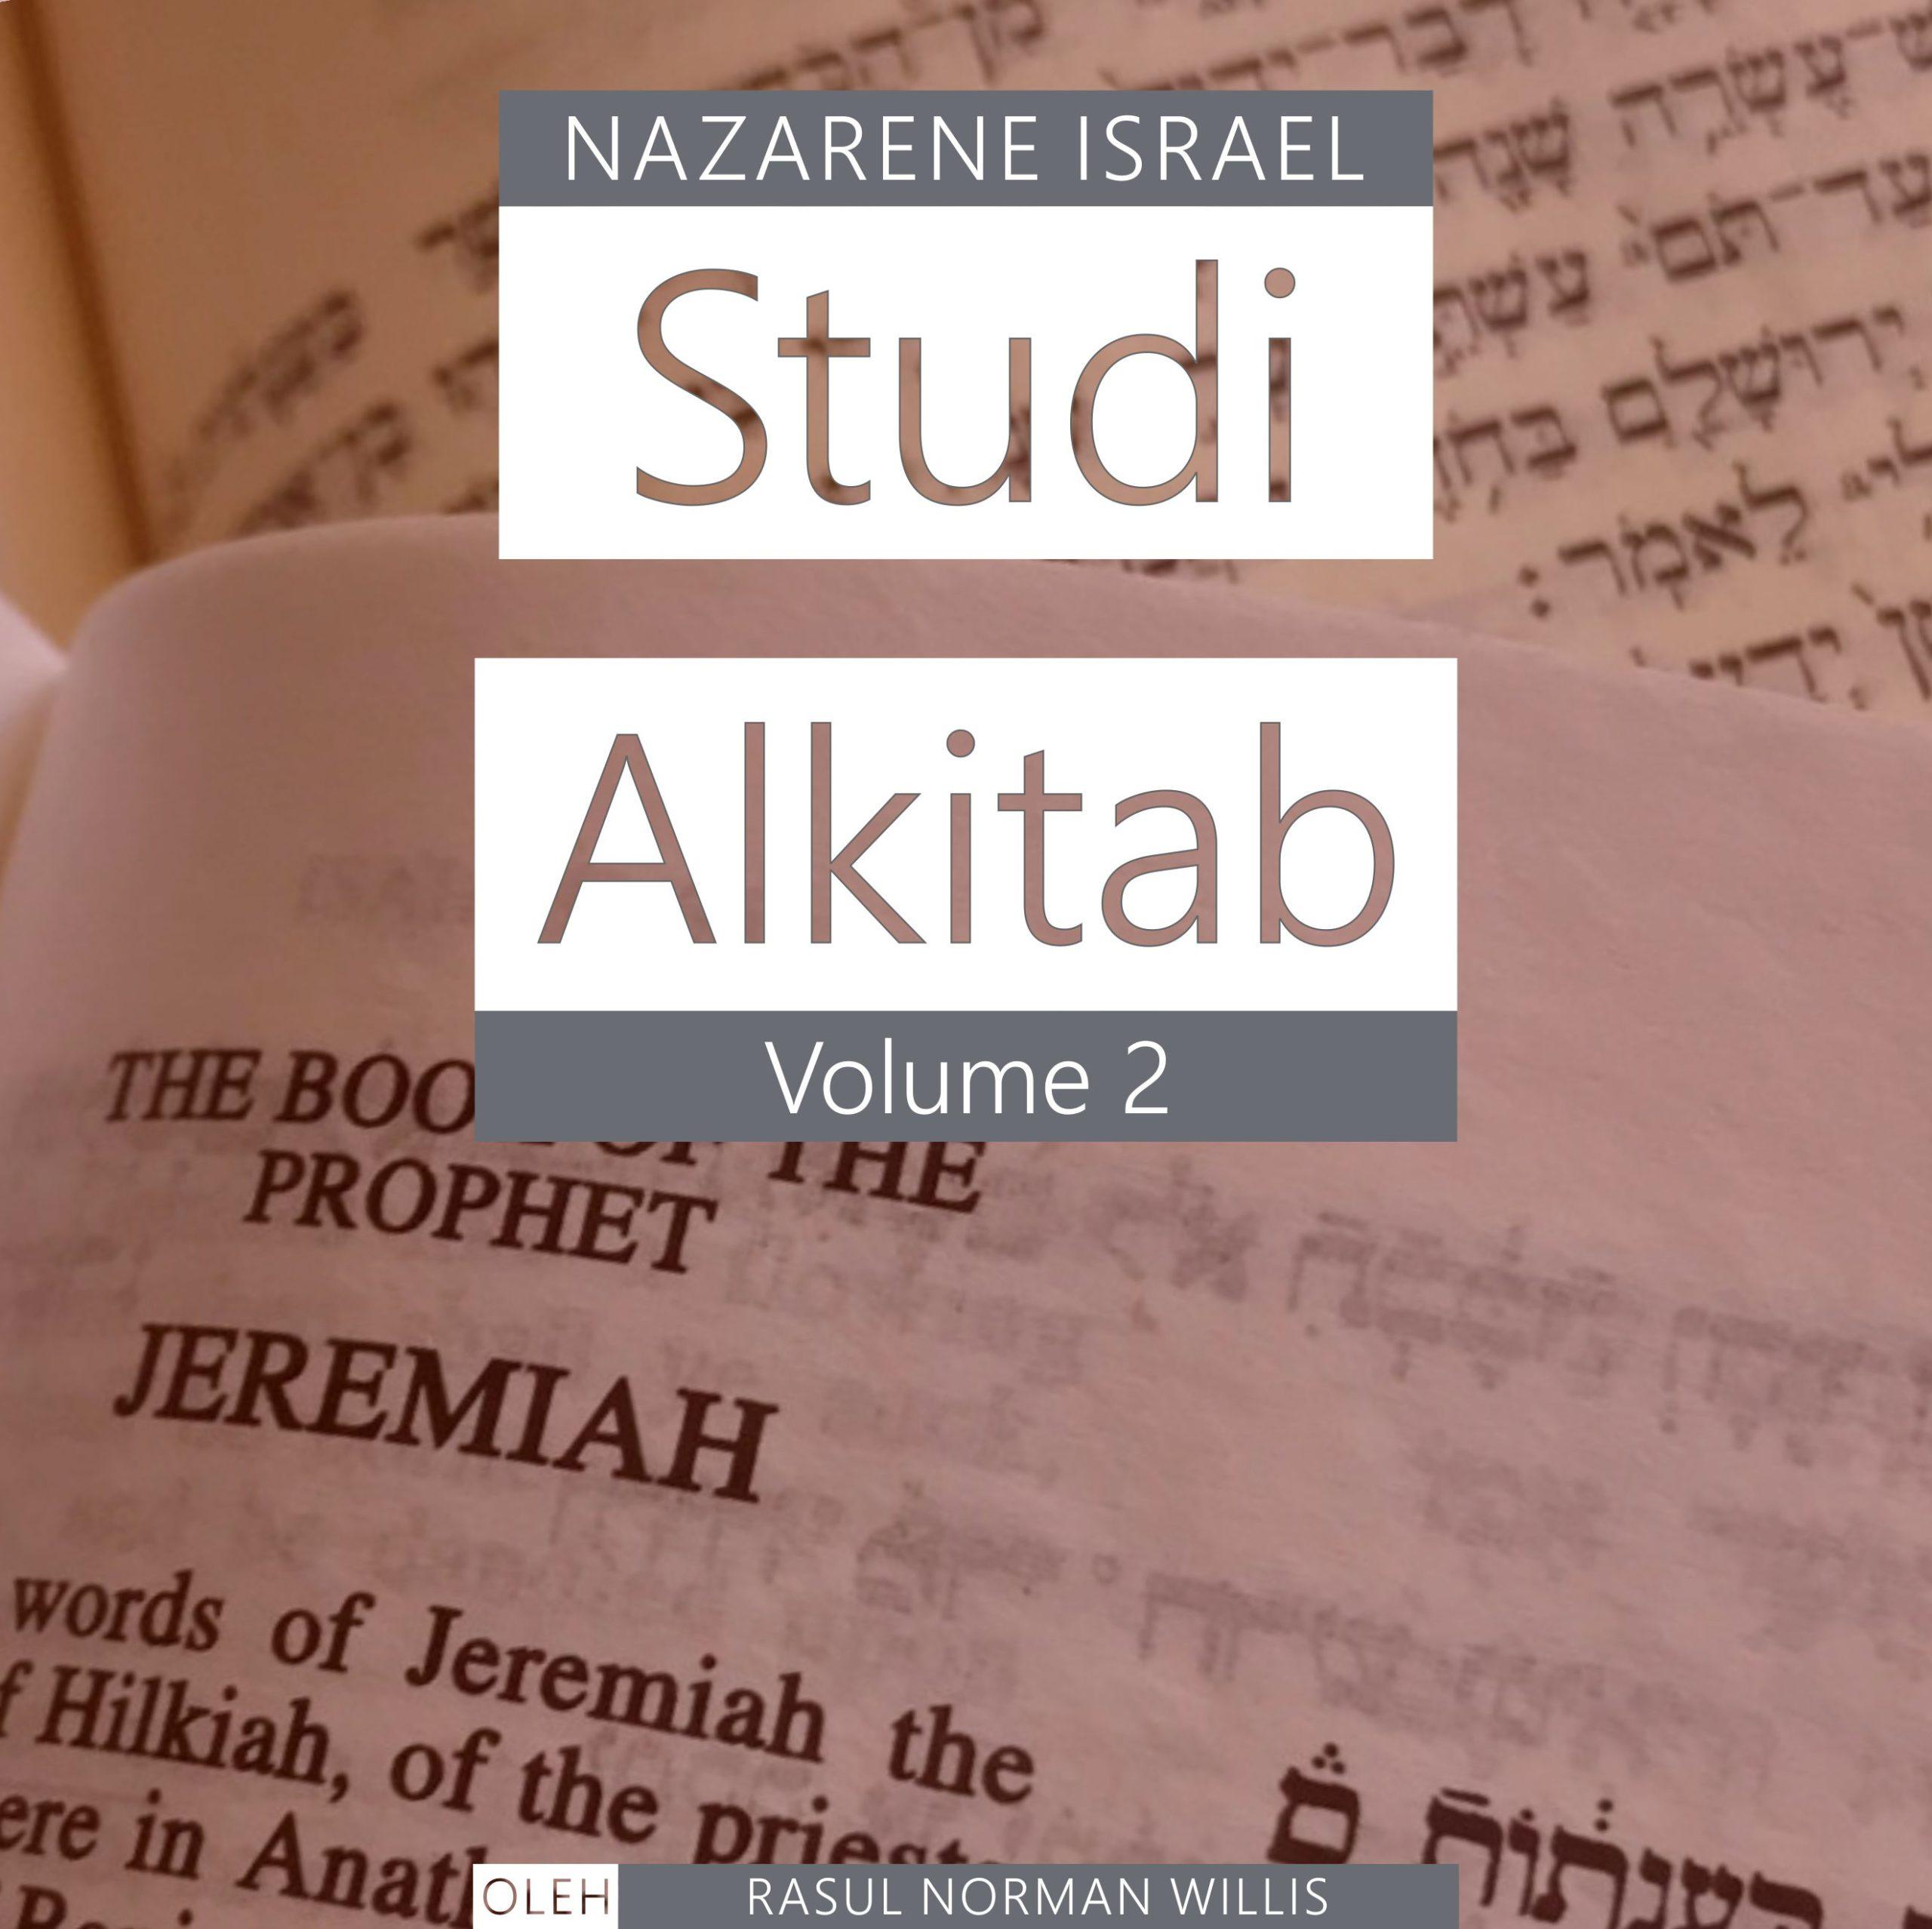 Studi Alkitab Nazaret Vol. 2